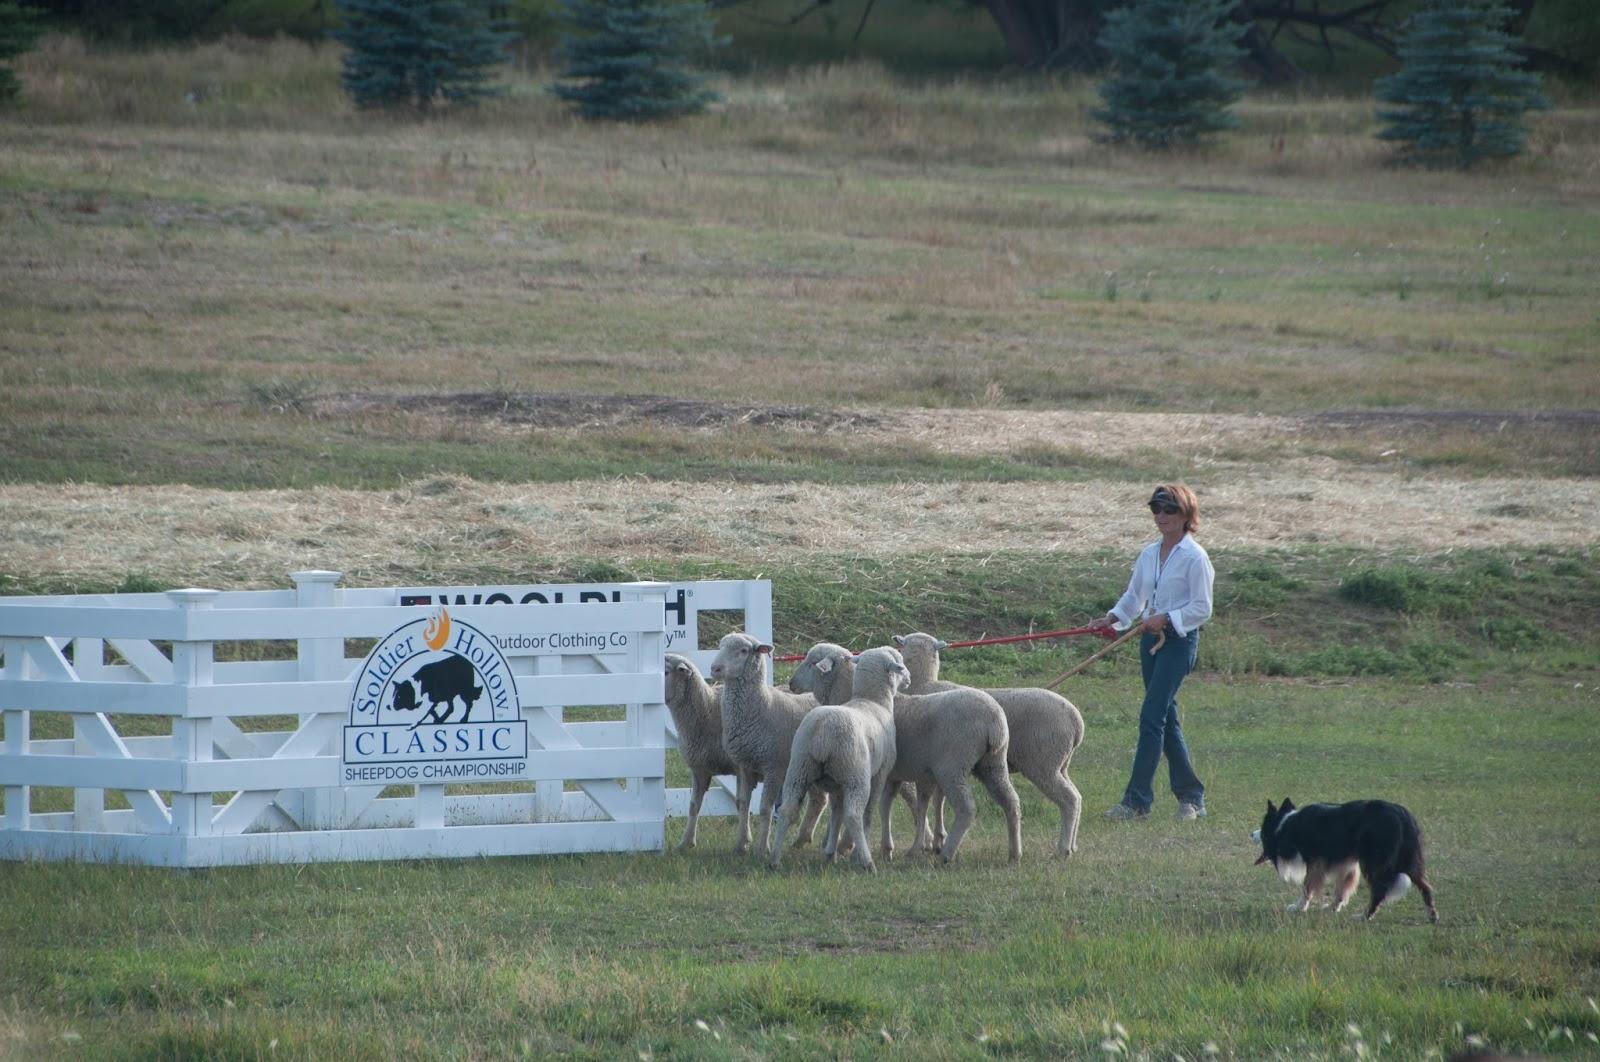 midway utah, sheep dogs, sheep, sheep dog festival, midway classic sheep dog festival, dog festival